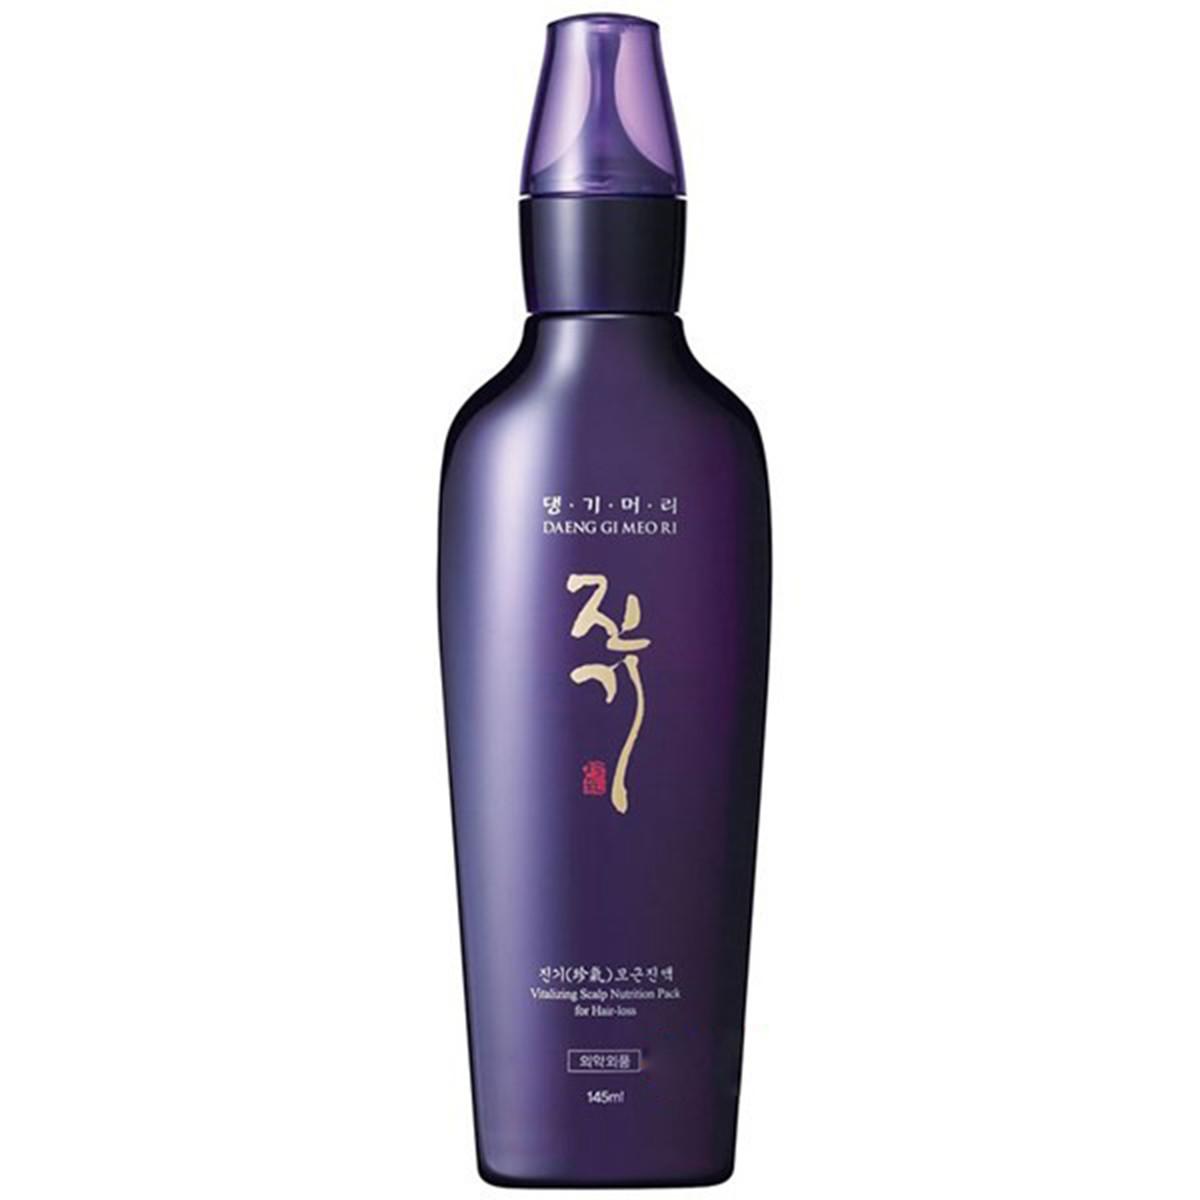 Регенерирующая эмульсия Daeng Gi Meo Ri Vitalizing Scalp Pack For Hair-Loss Против выпадения волос 145 мл